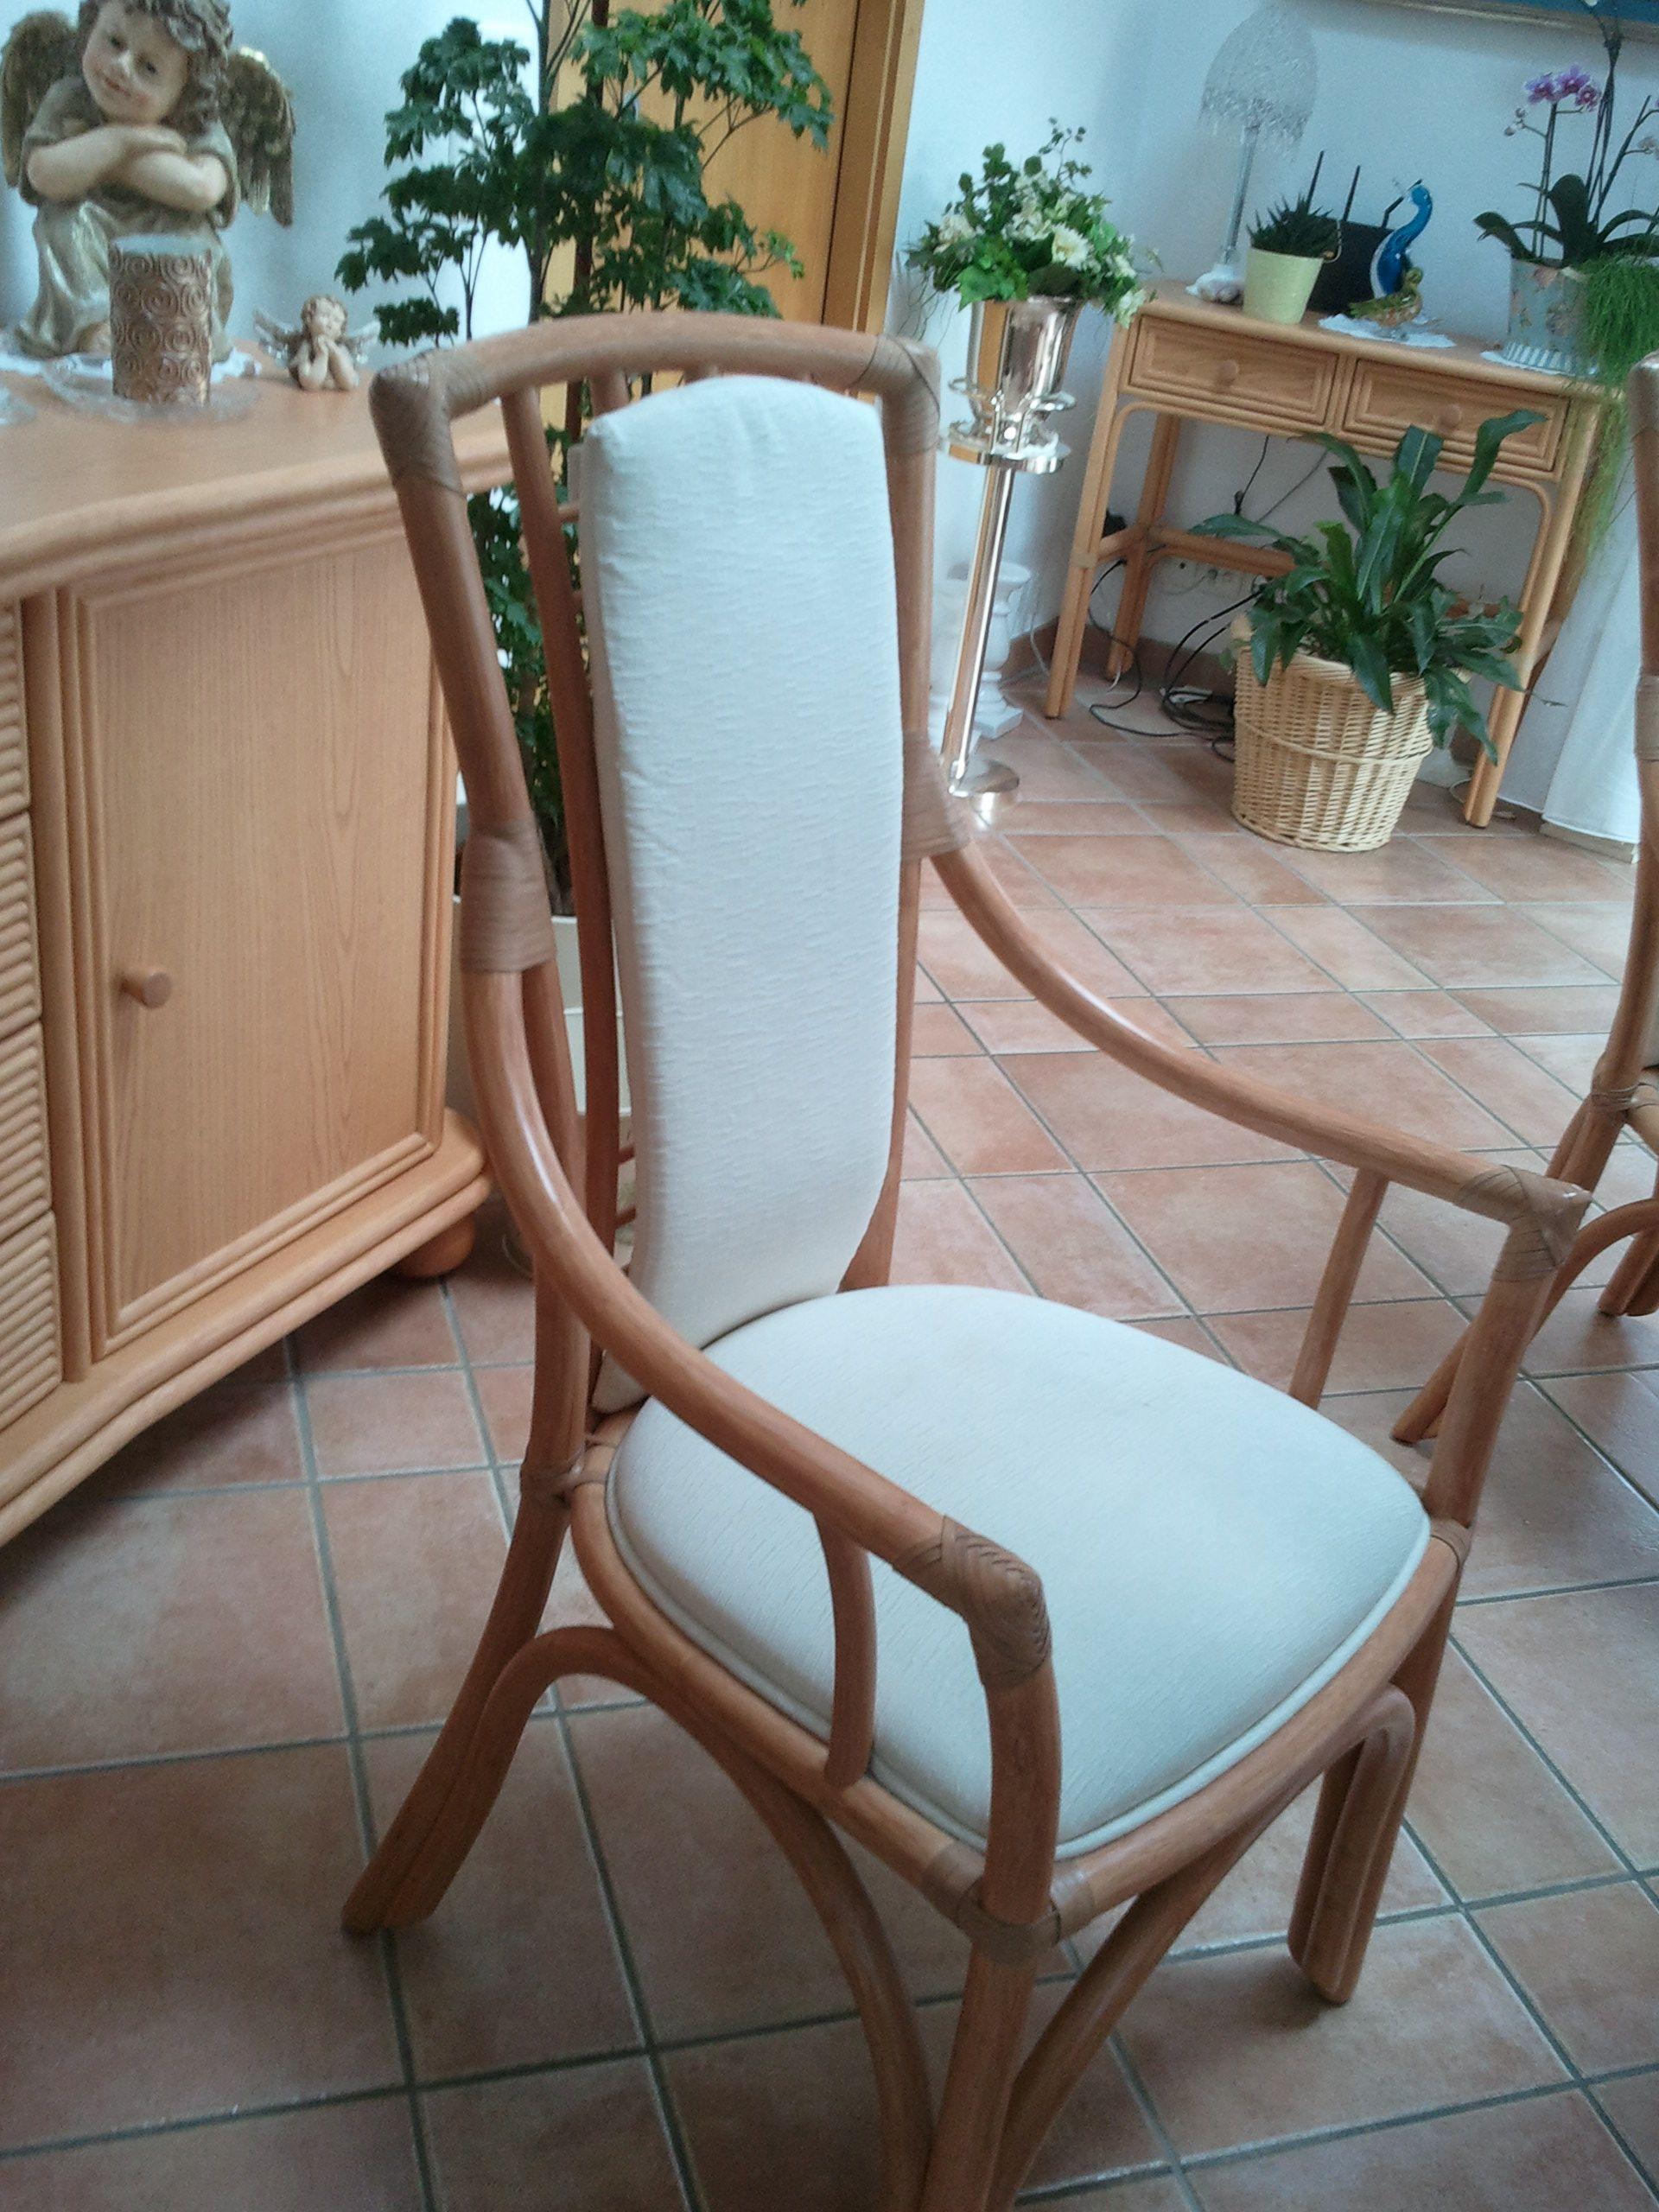 polsterei in seon im aargau sofas polstern. Black Bedroom Furniture Sets. Home Design Ideas